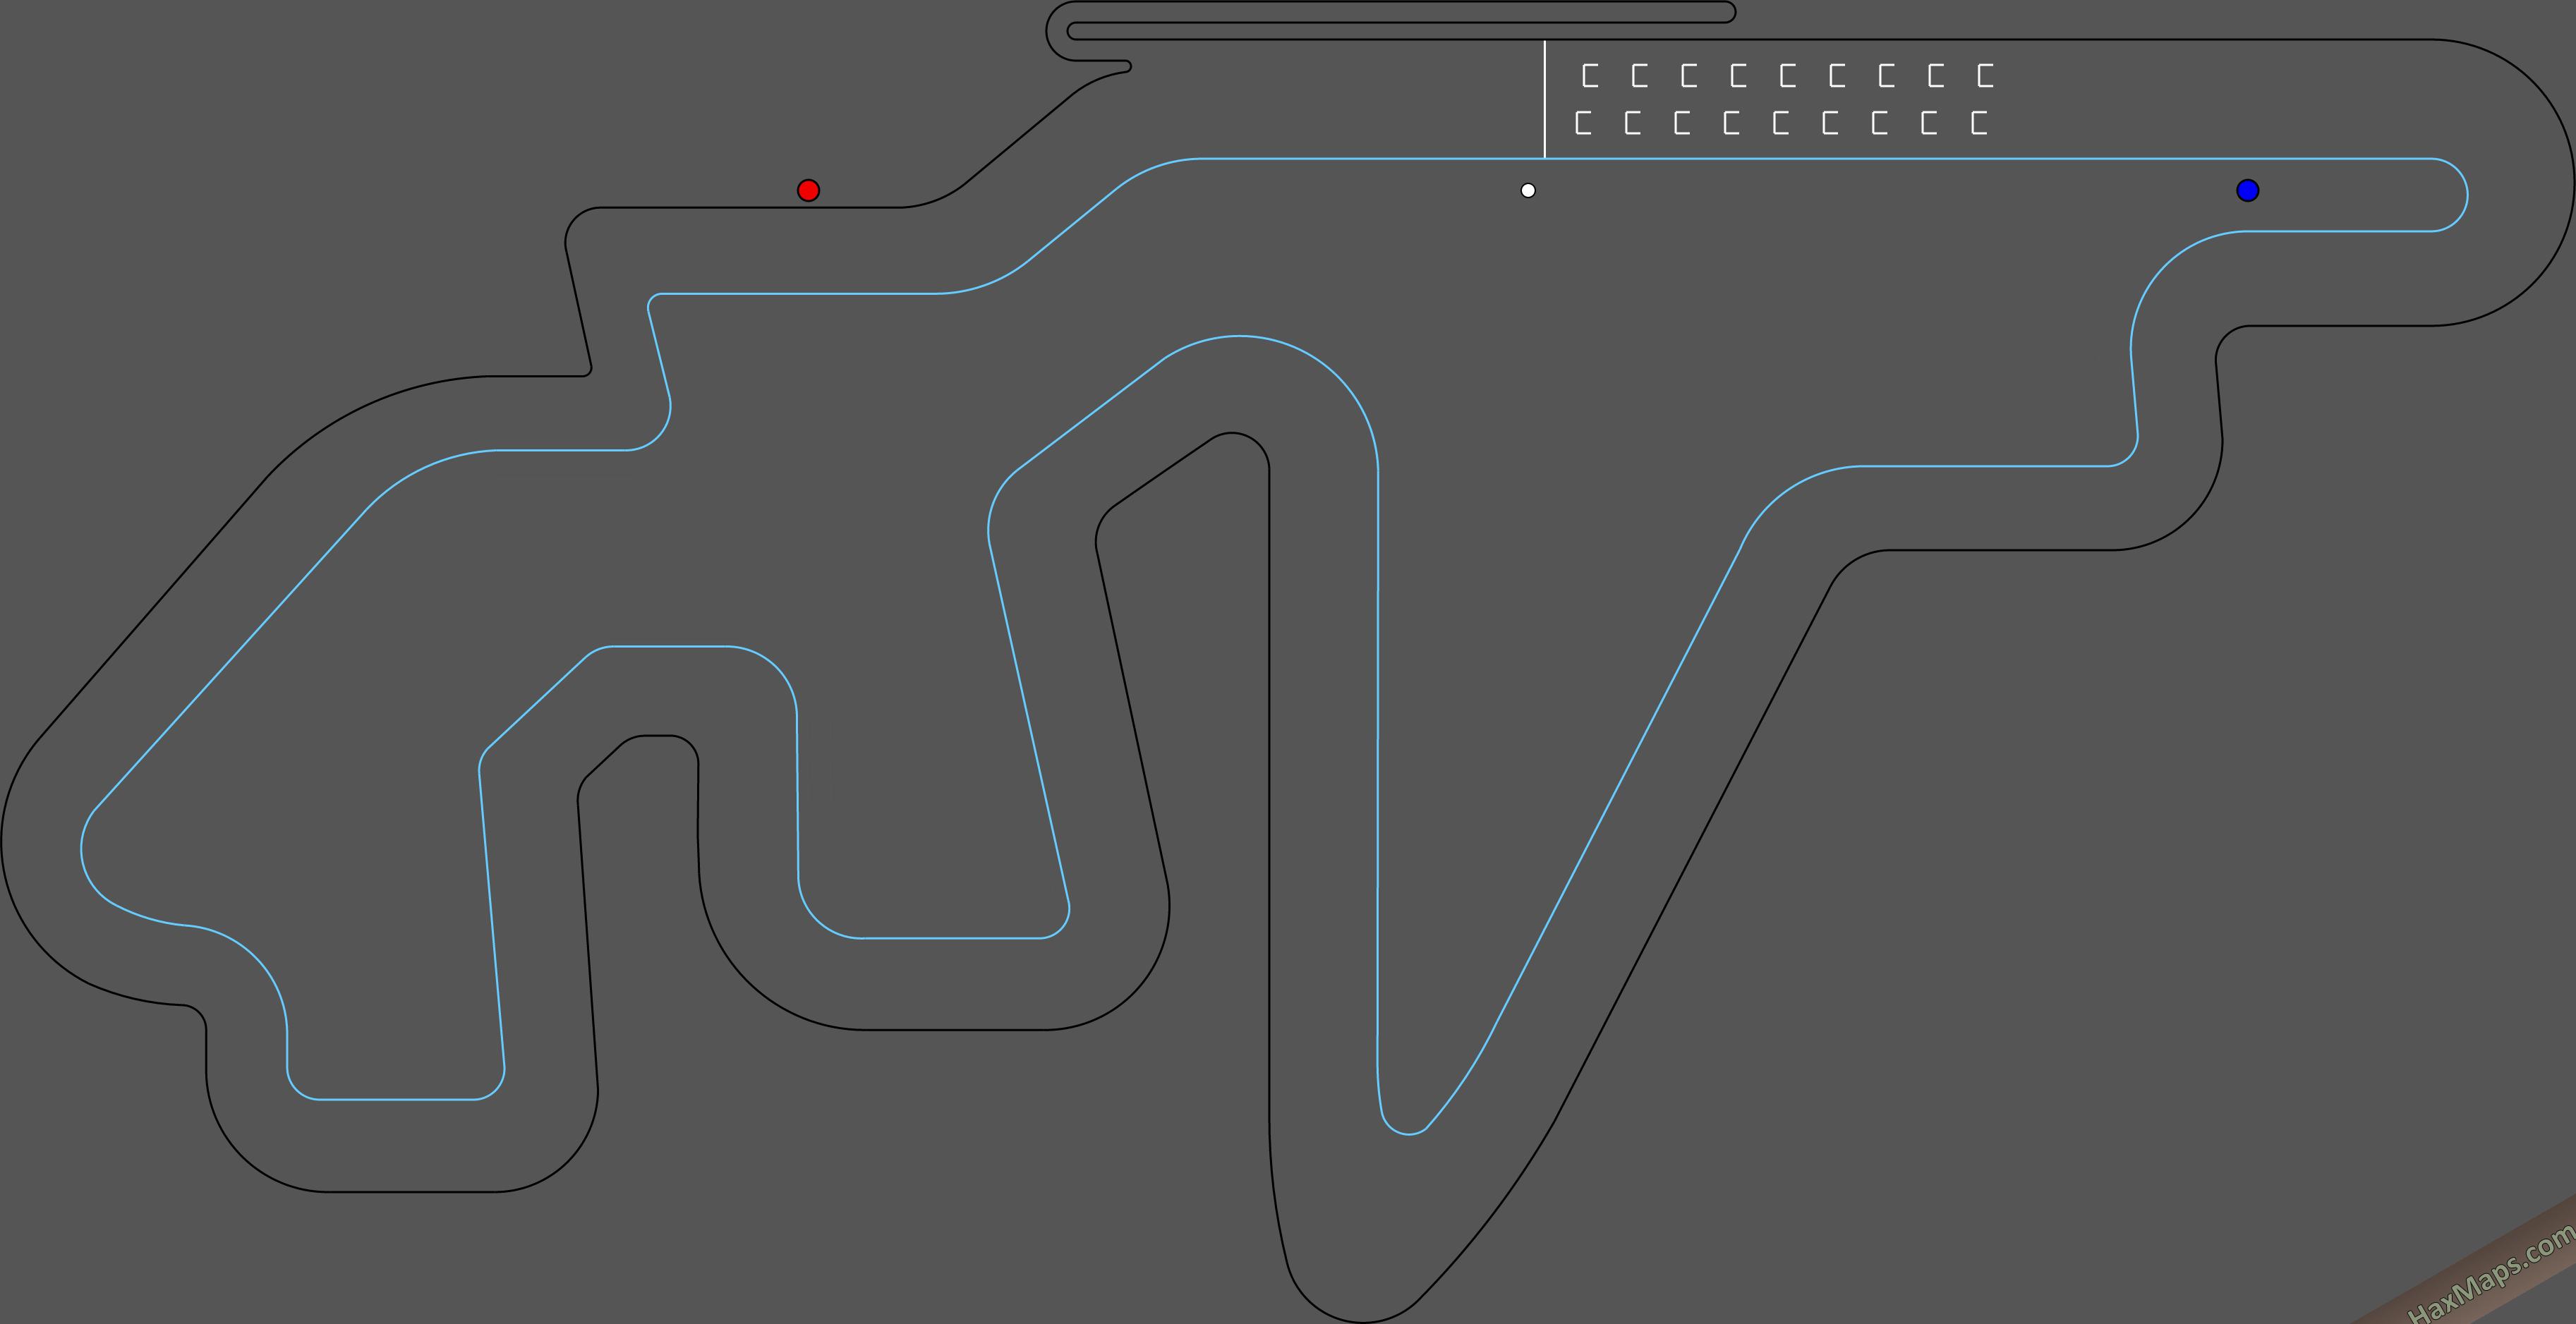 hax ball maps | Yas Marina F1 by Kor GP A